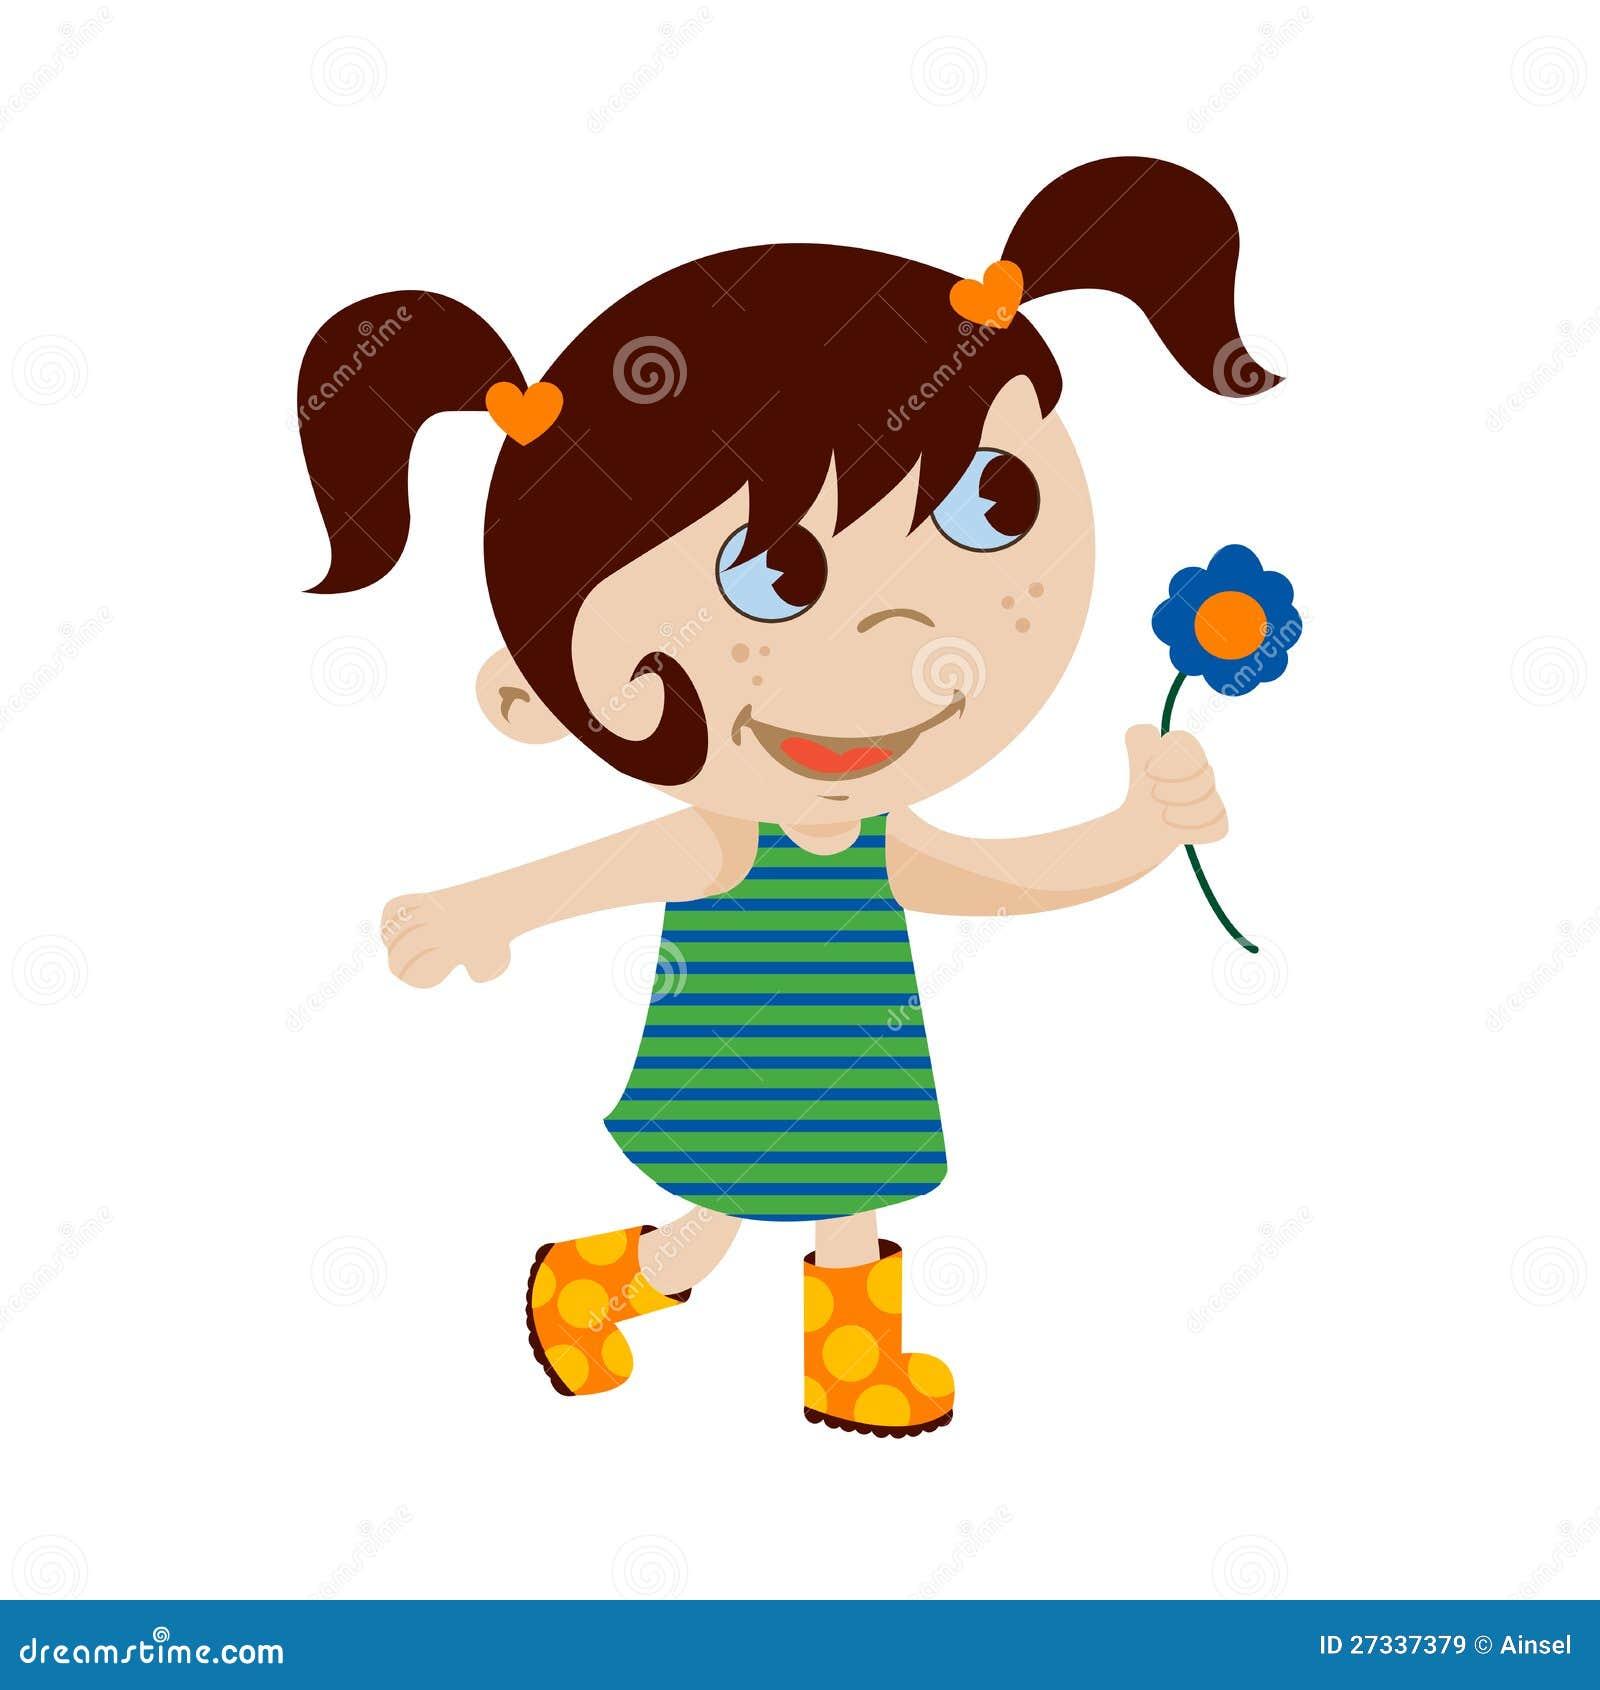 petite fille avec la fleur - Dessin De Petite Fille